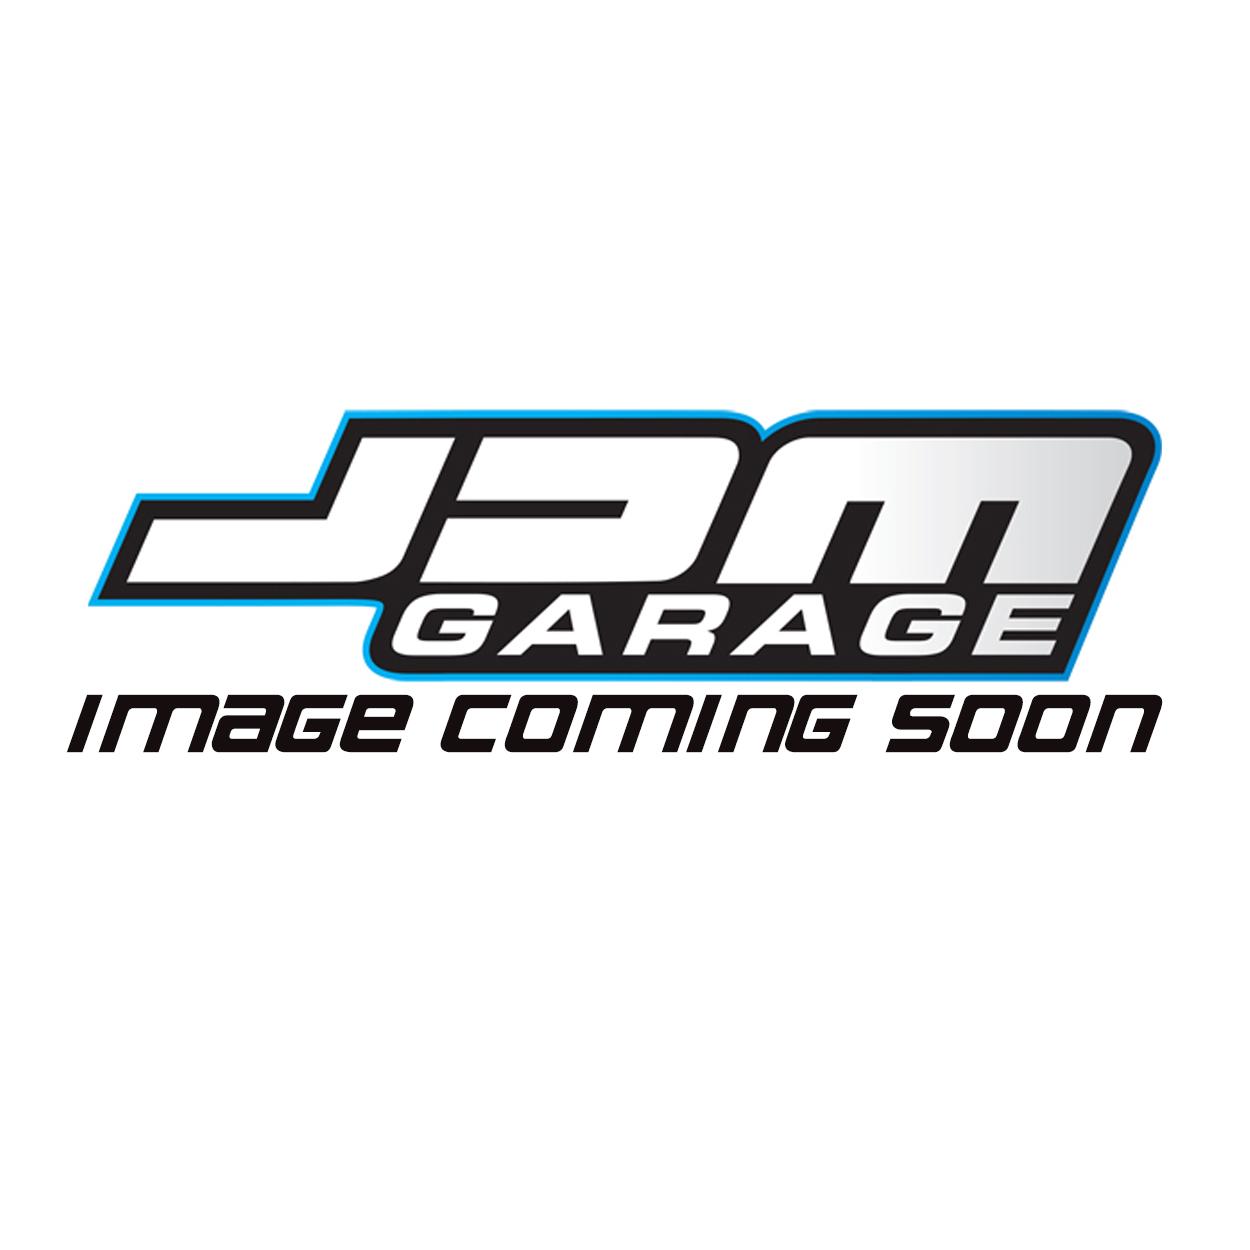 Genuine Nissan RH Rear Brake Disc Backing Plate Fits Skyline R32 R33 R34 GTR Stagea WGNC34 260RS 44020-12U10